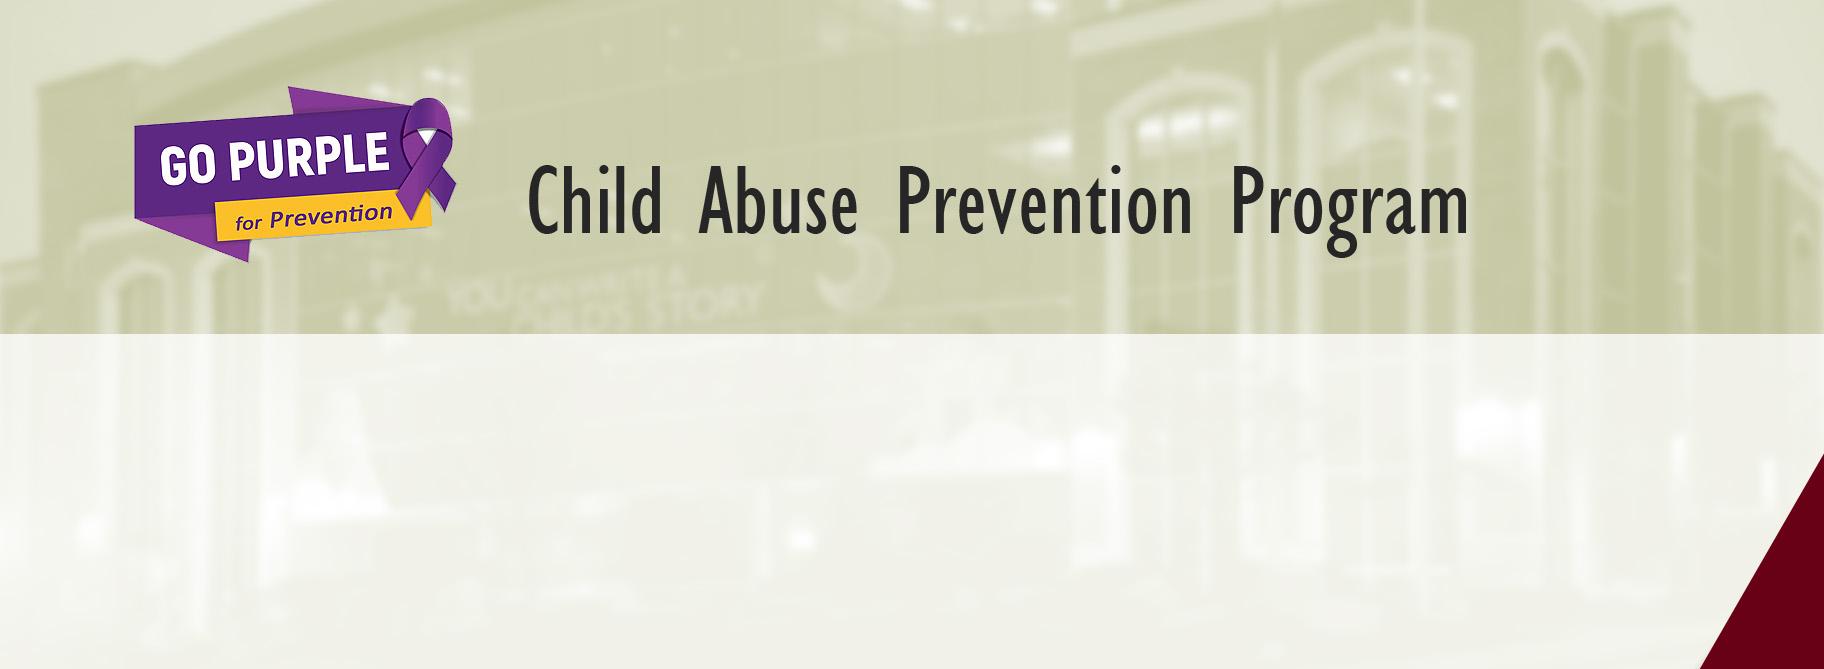 Child Abuse Prevention Program